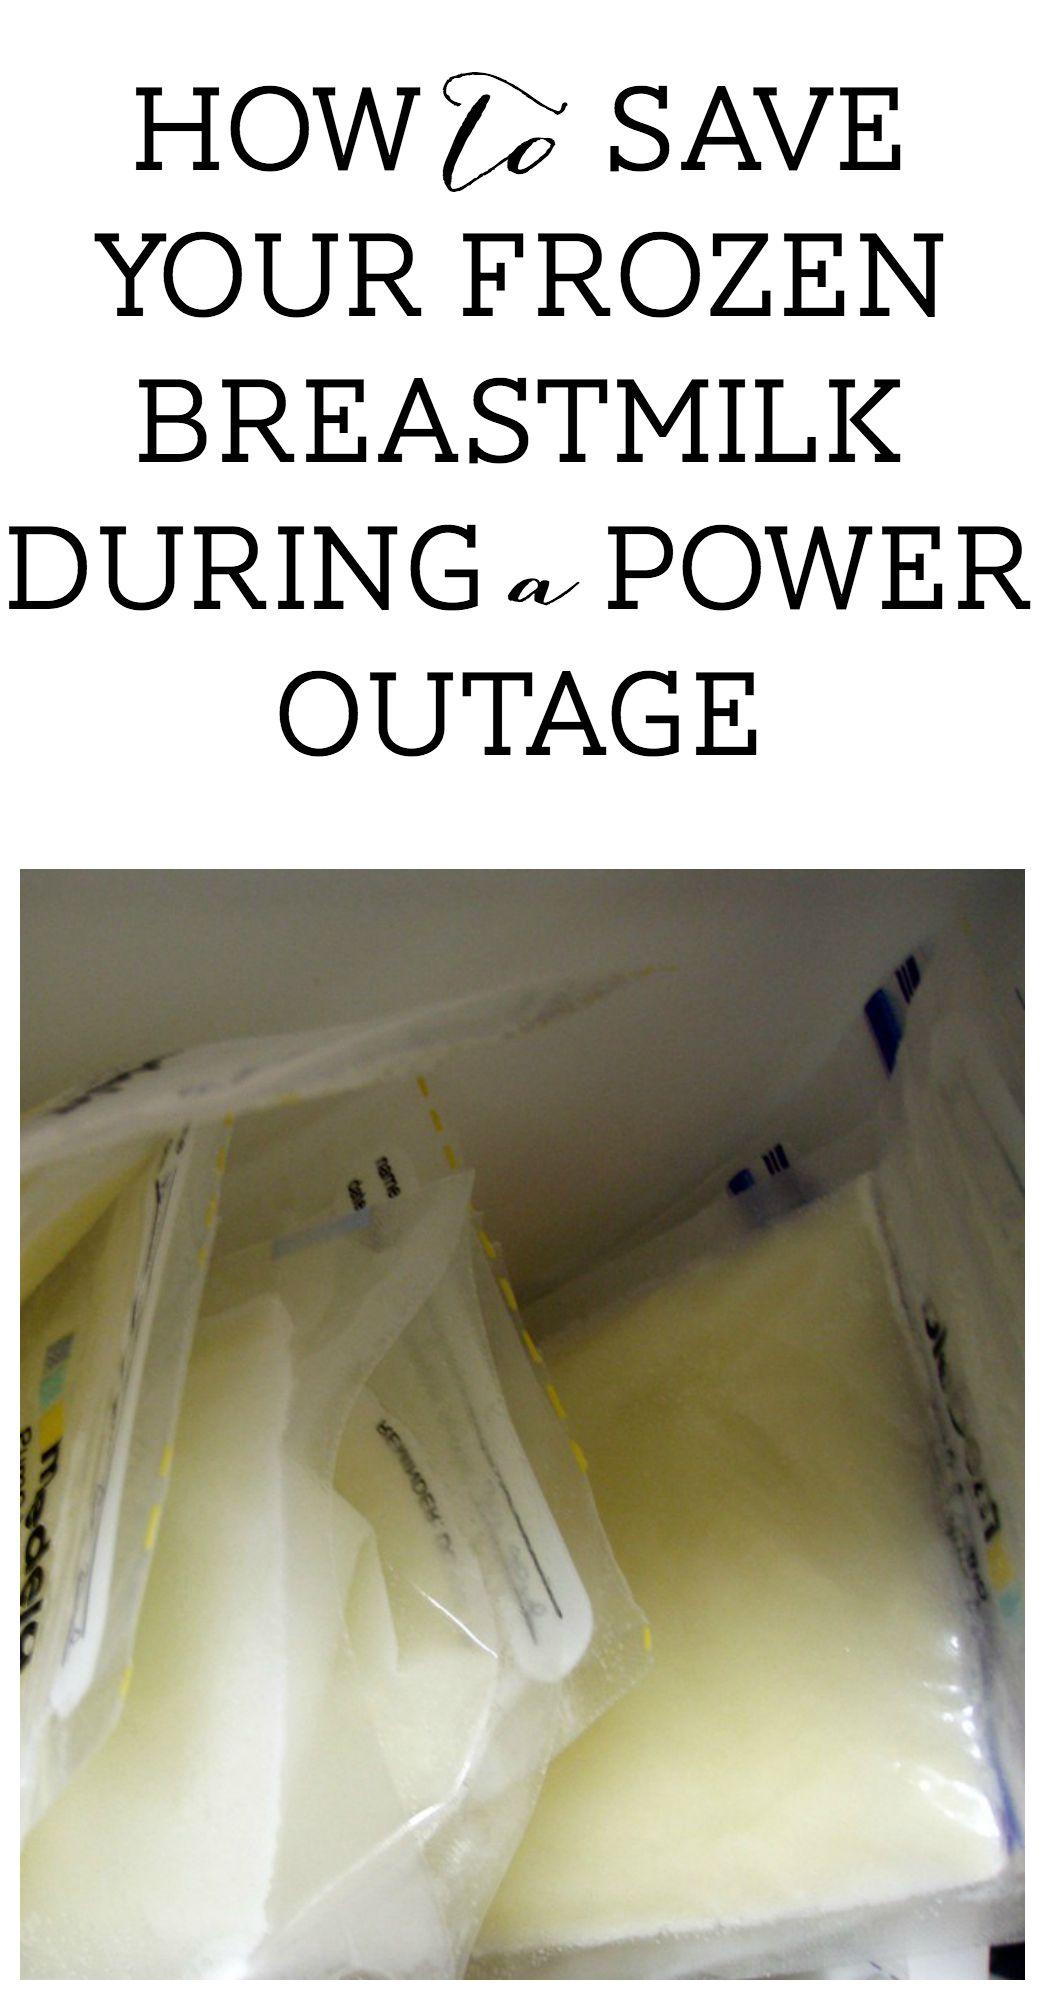 frozen breastmilk power outage